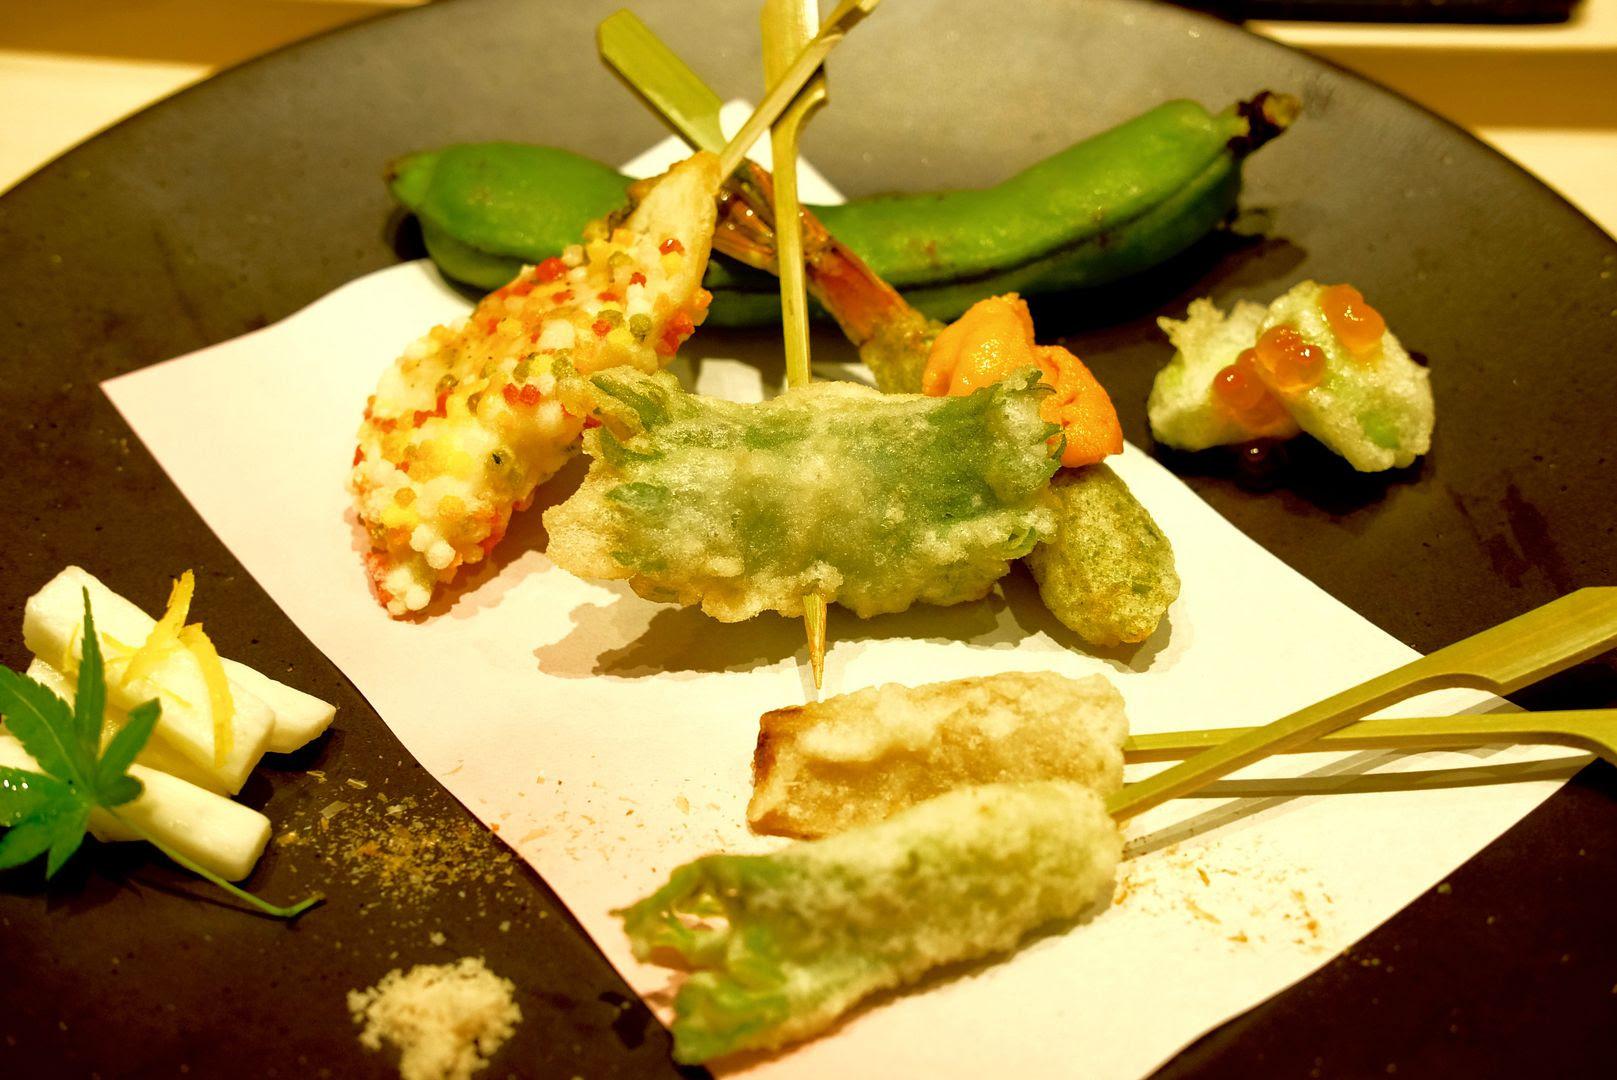 photo Hashida Sushi Omakase lunch 2.jpg